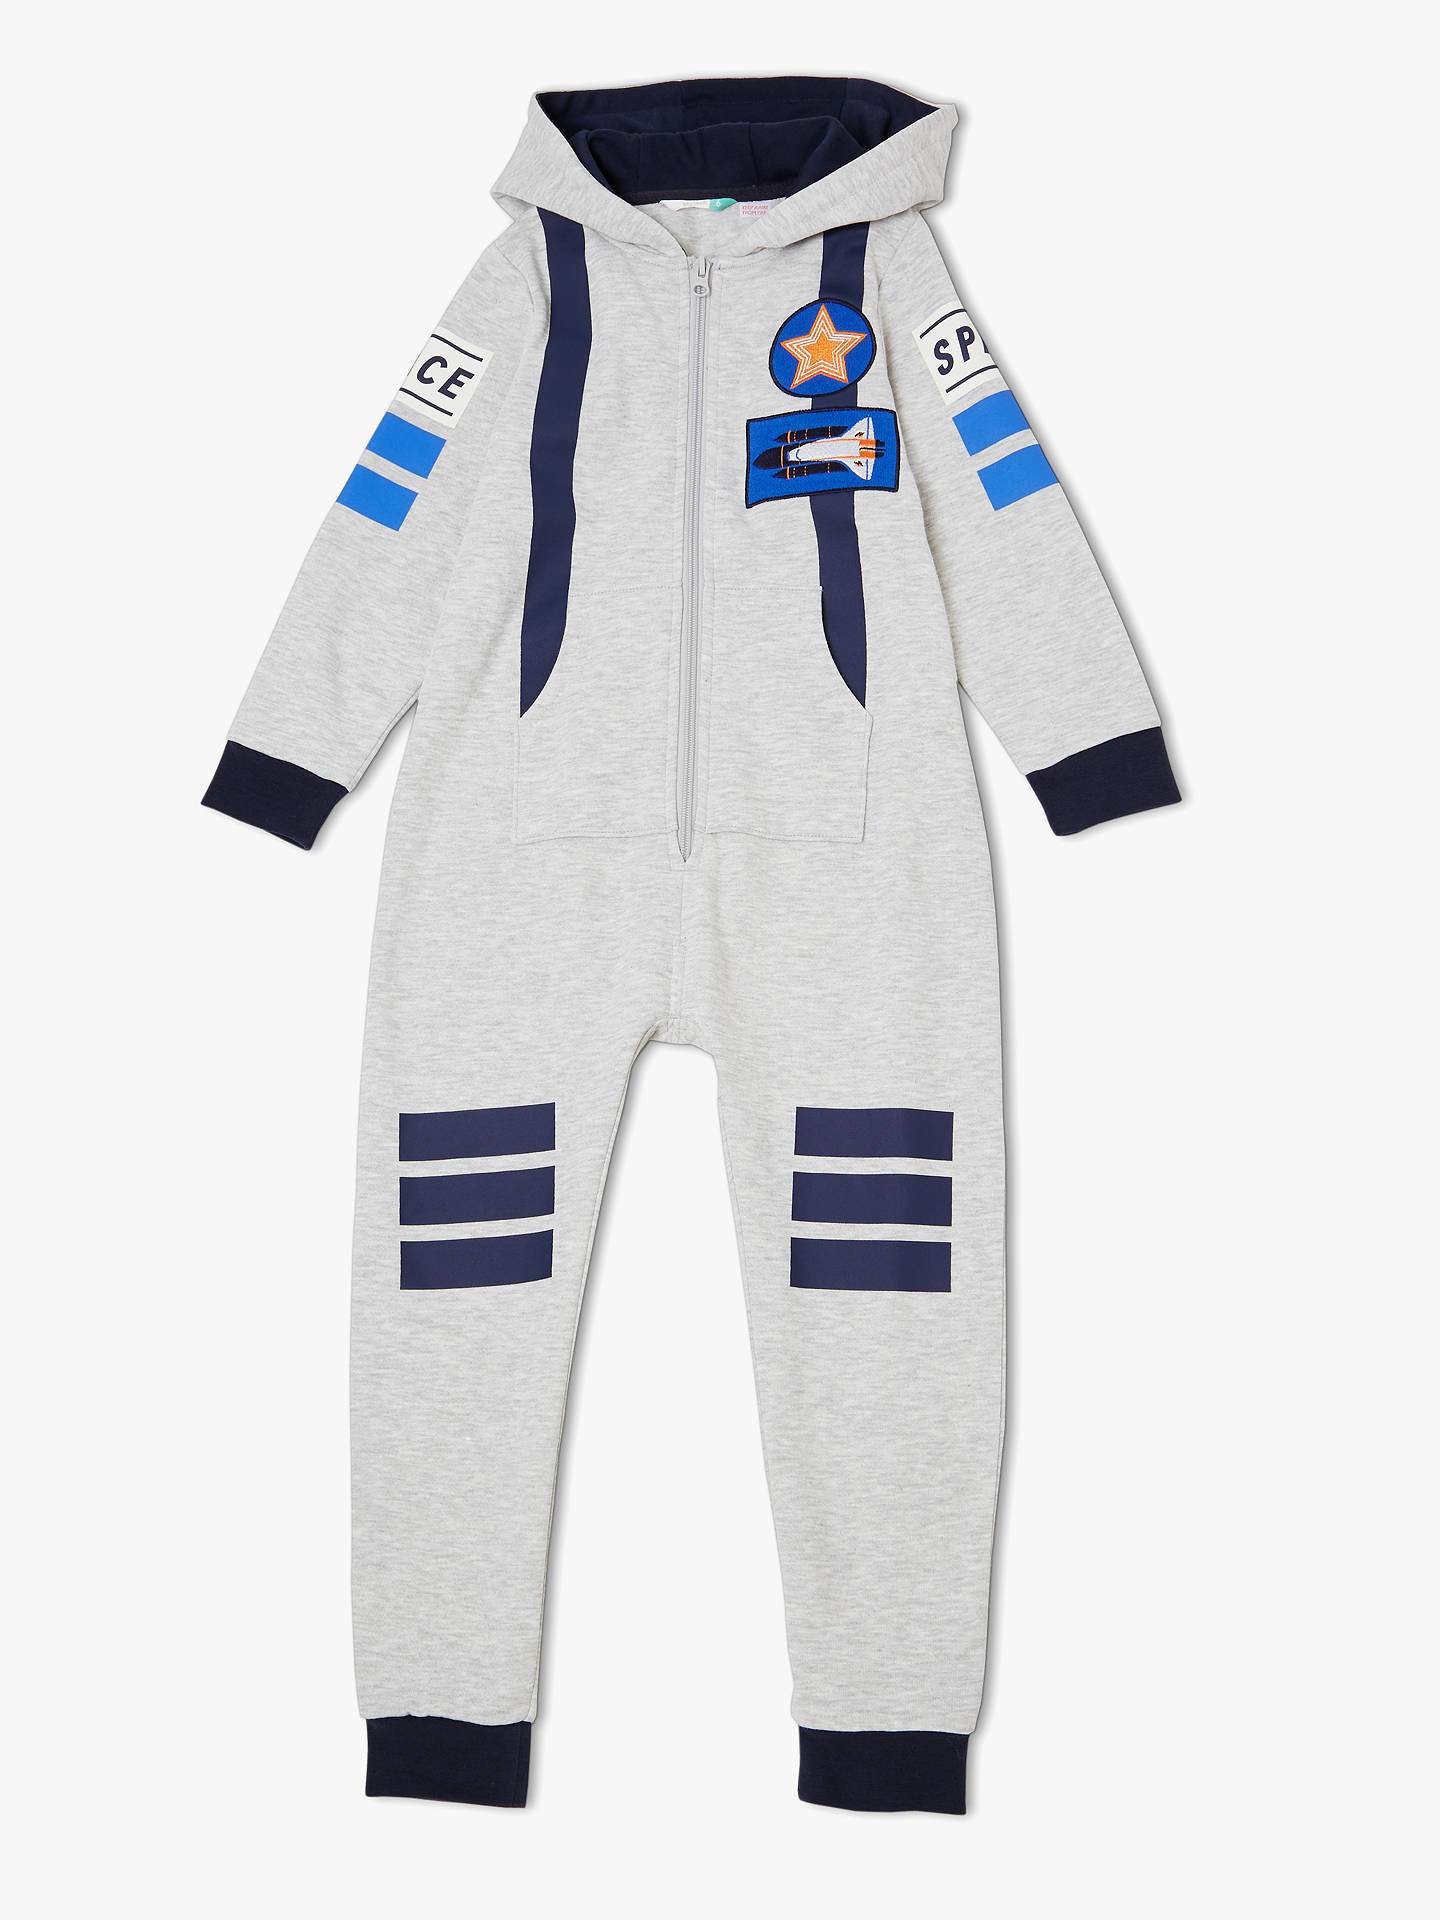 97bd5bc08 John Lewis   Partners Children s Astronaut Sweat Onesie